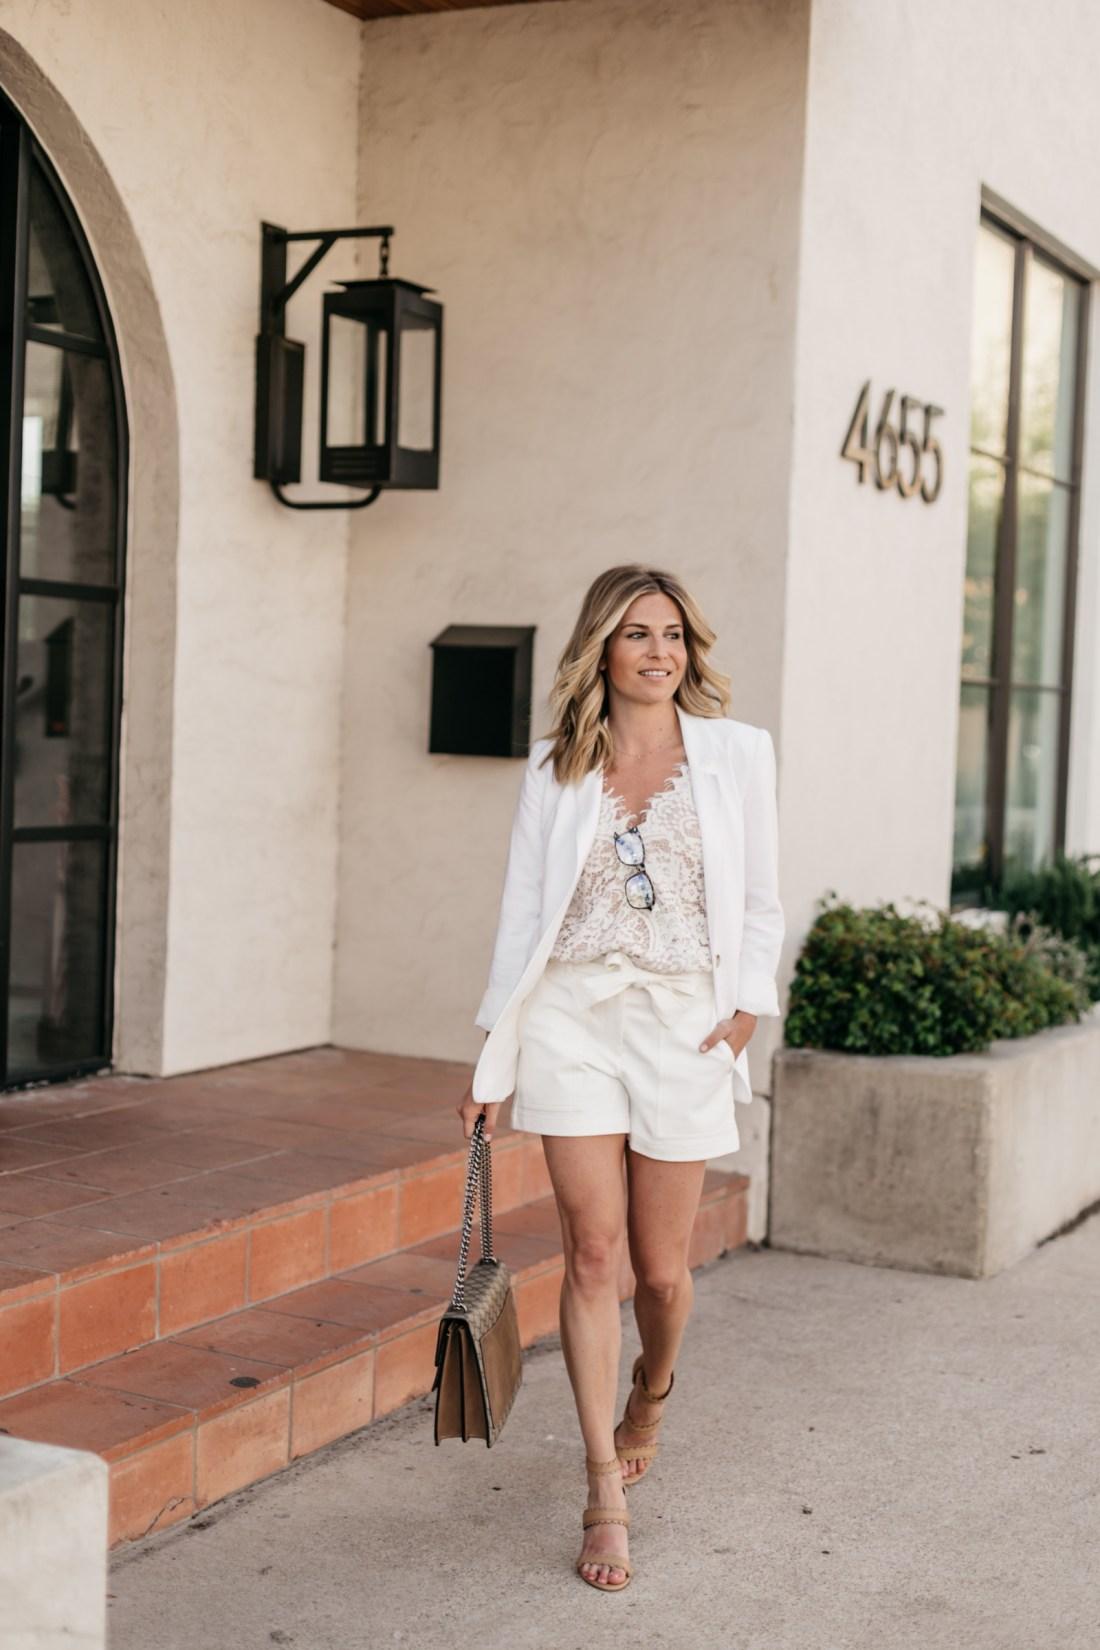 Brooke Burnett is wearing a preppy white outfit